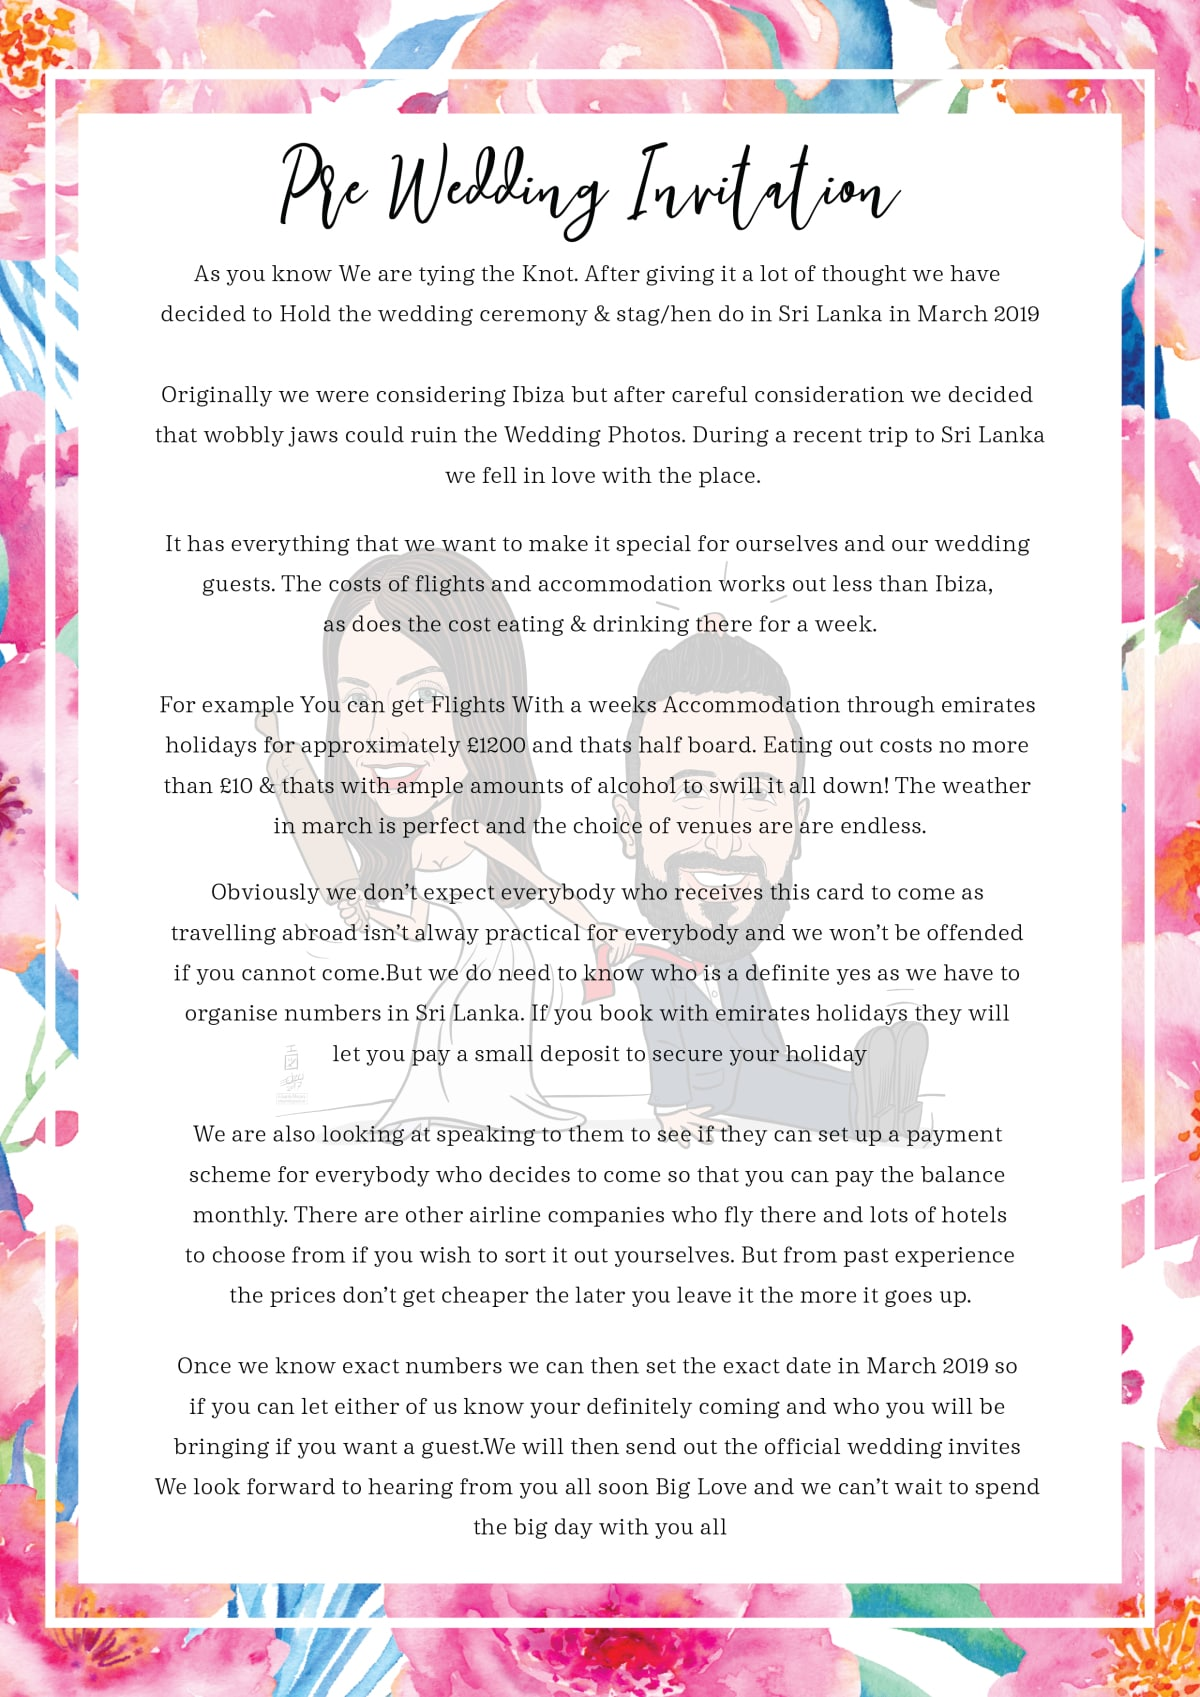 Create wedding invitation card by Theblueisland